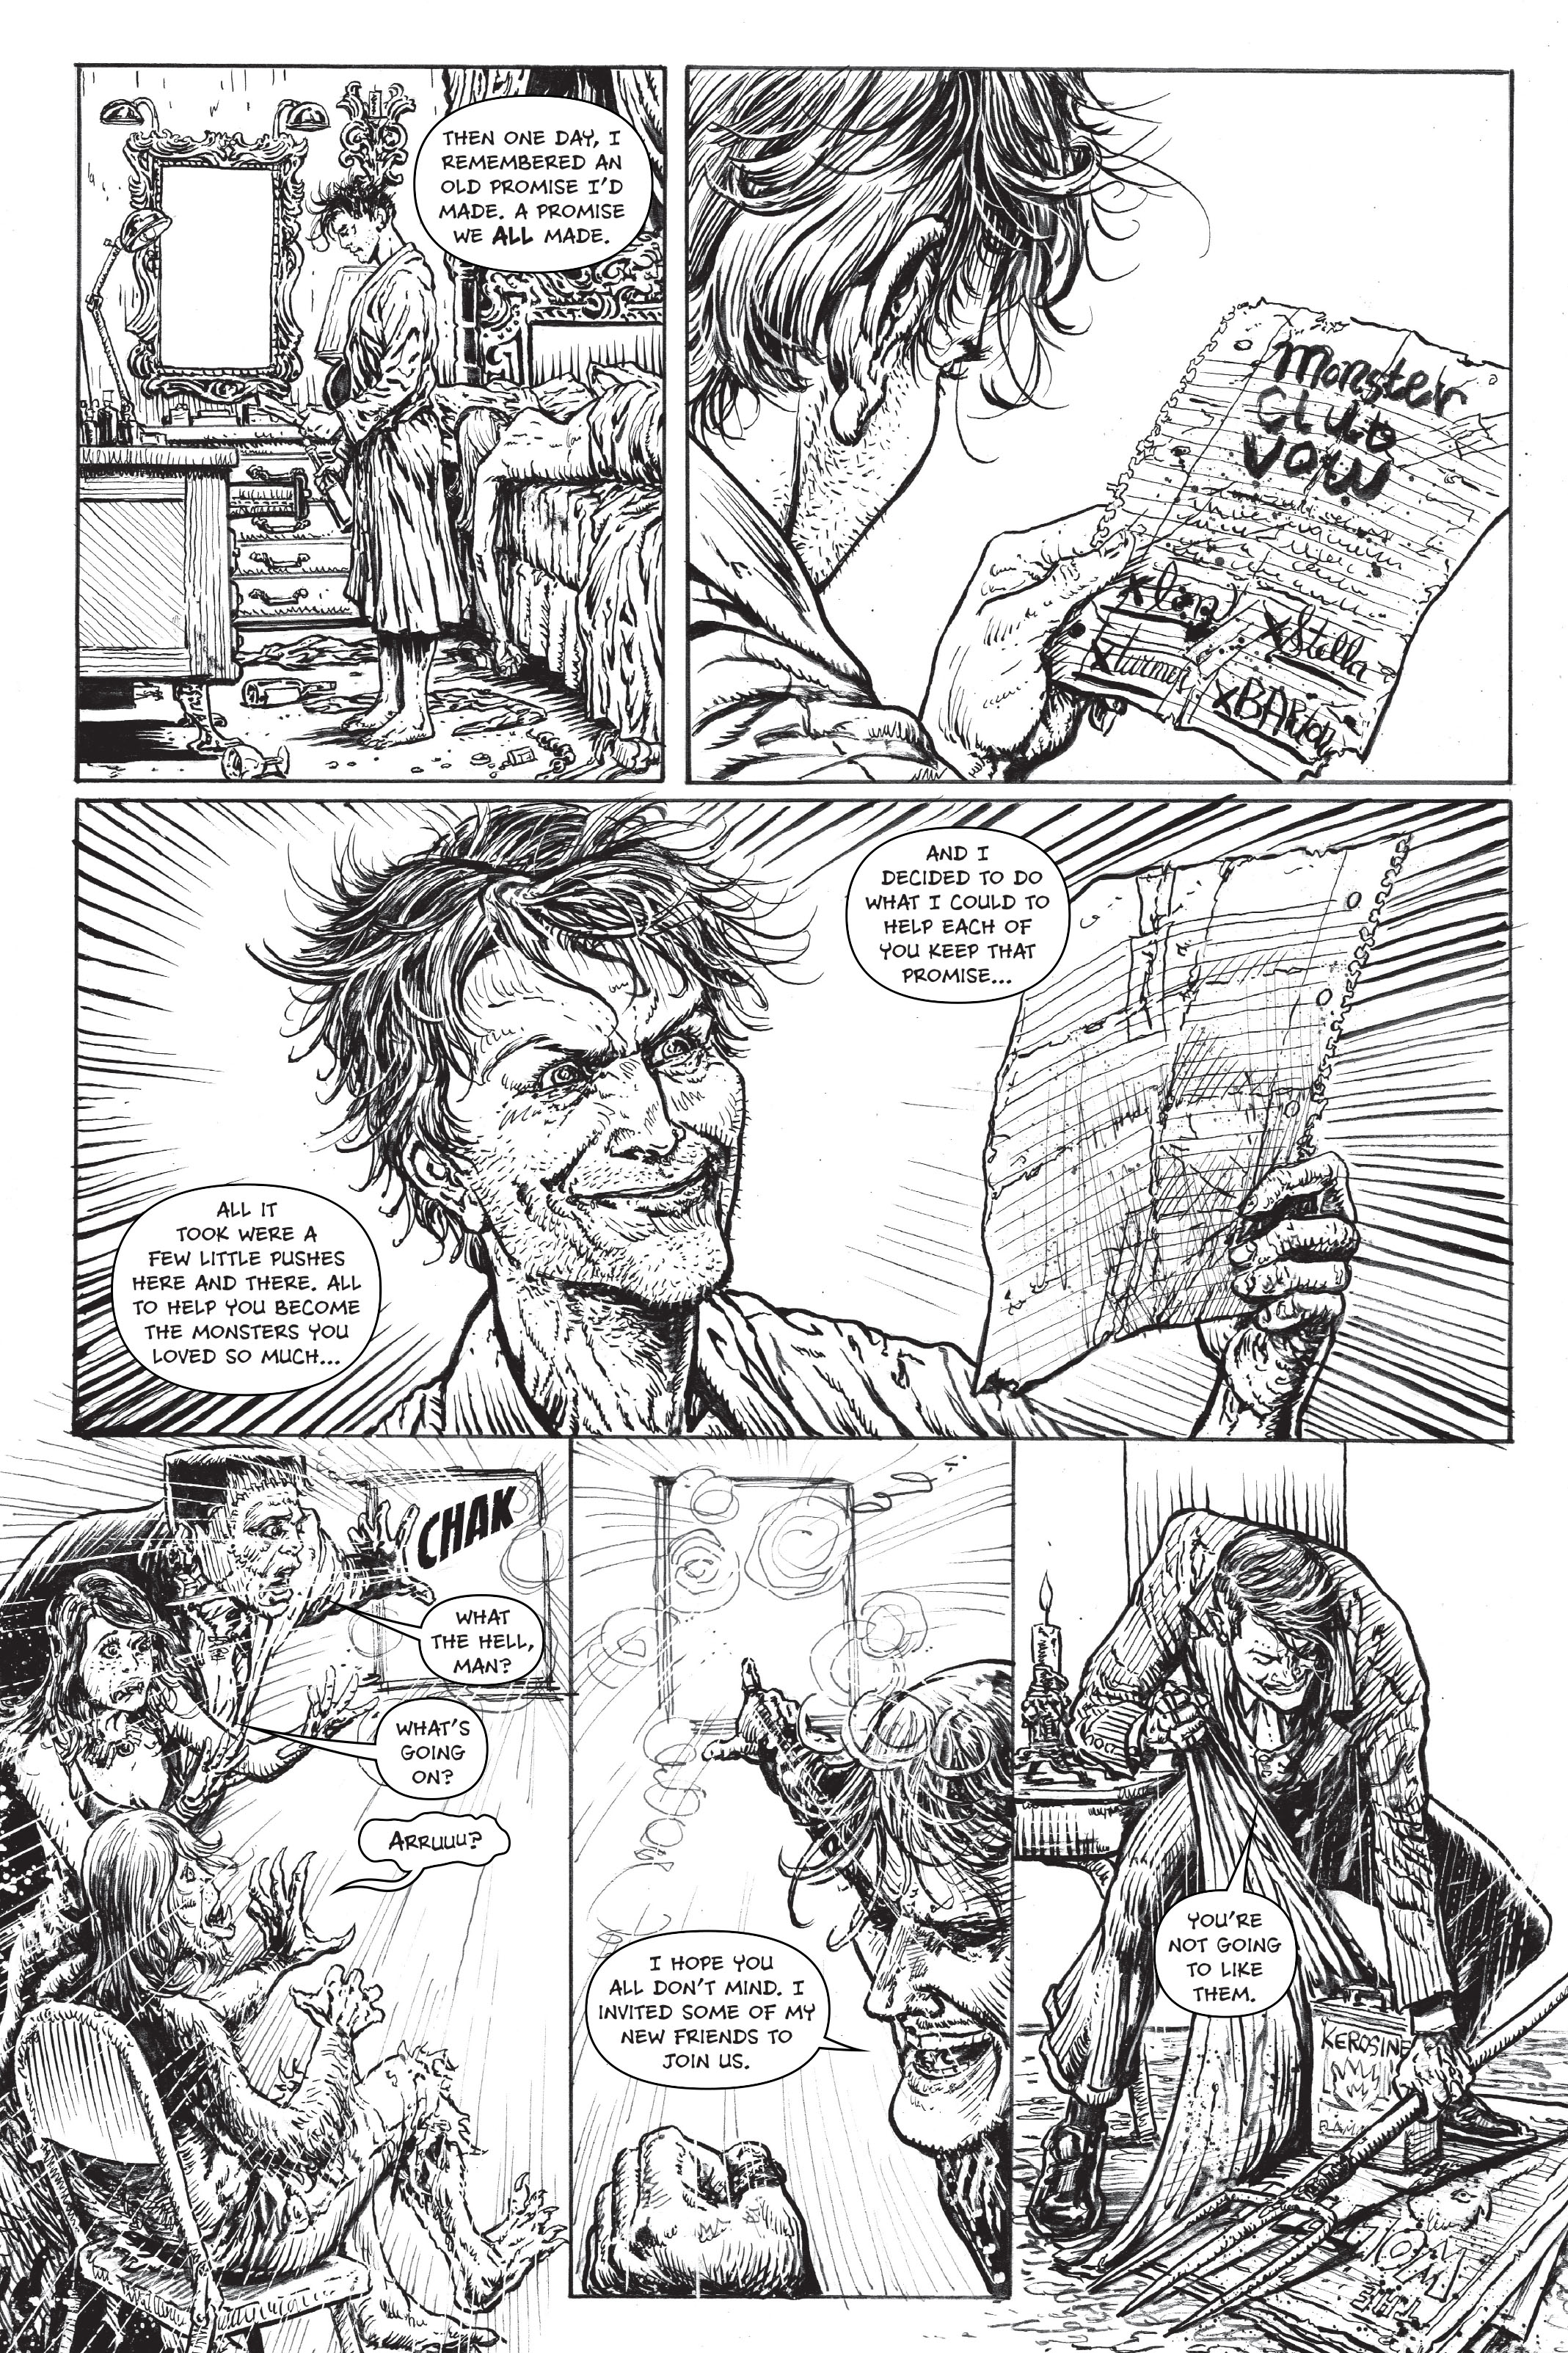 MC page 009.jpg